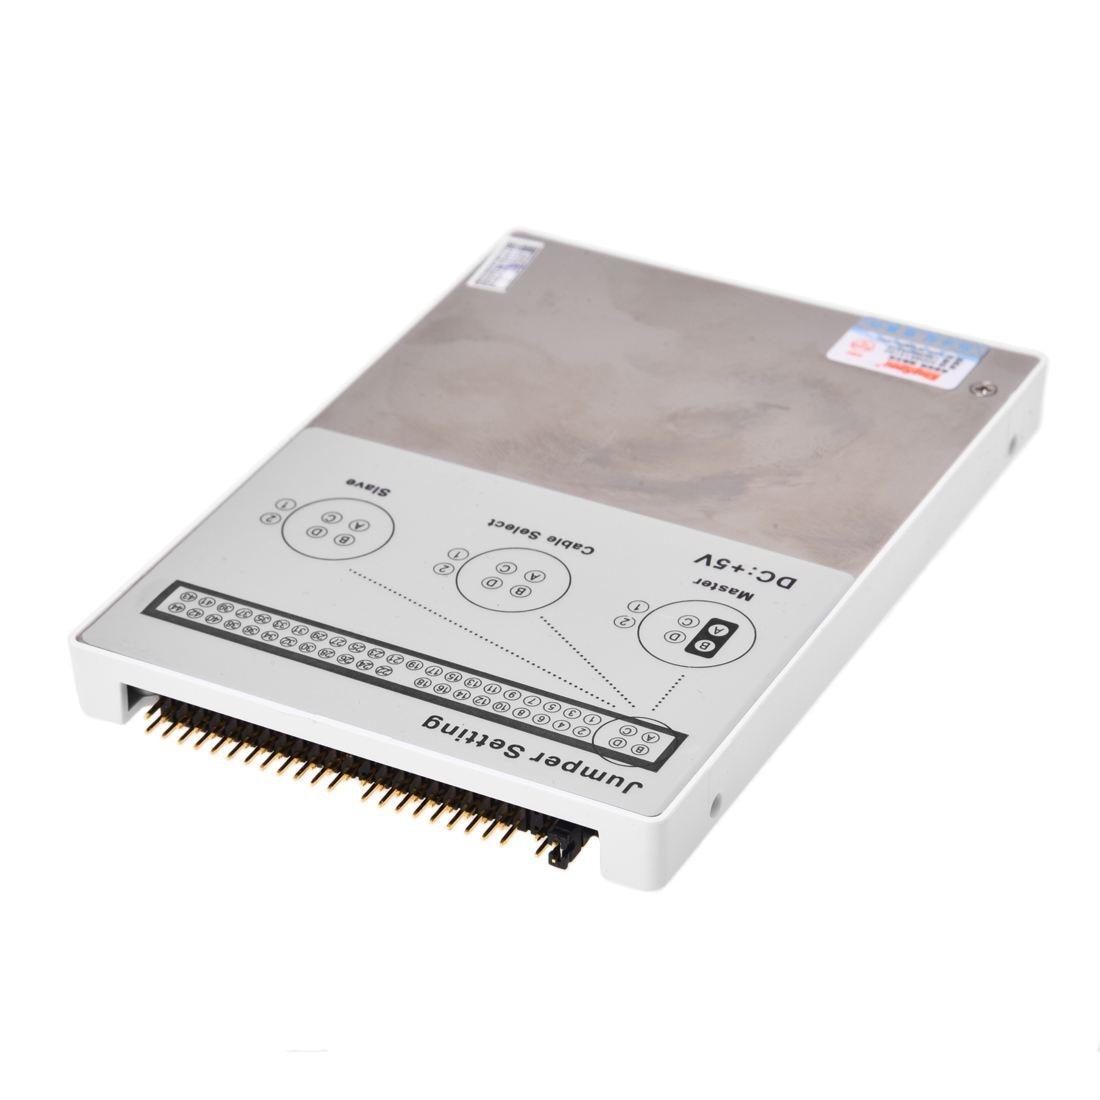 KingSpec 32GB 2 5 inch PATA IDE SSD Solid State font b Disk b font MLC